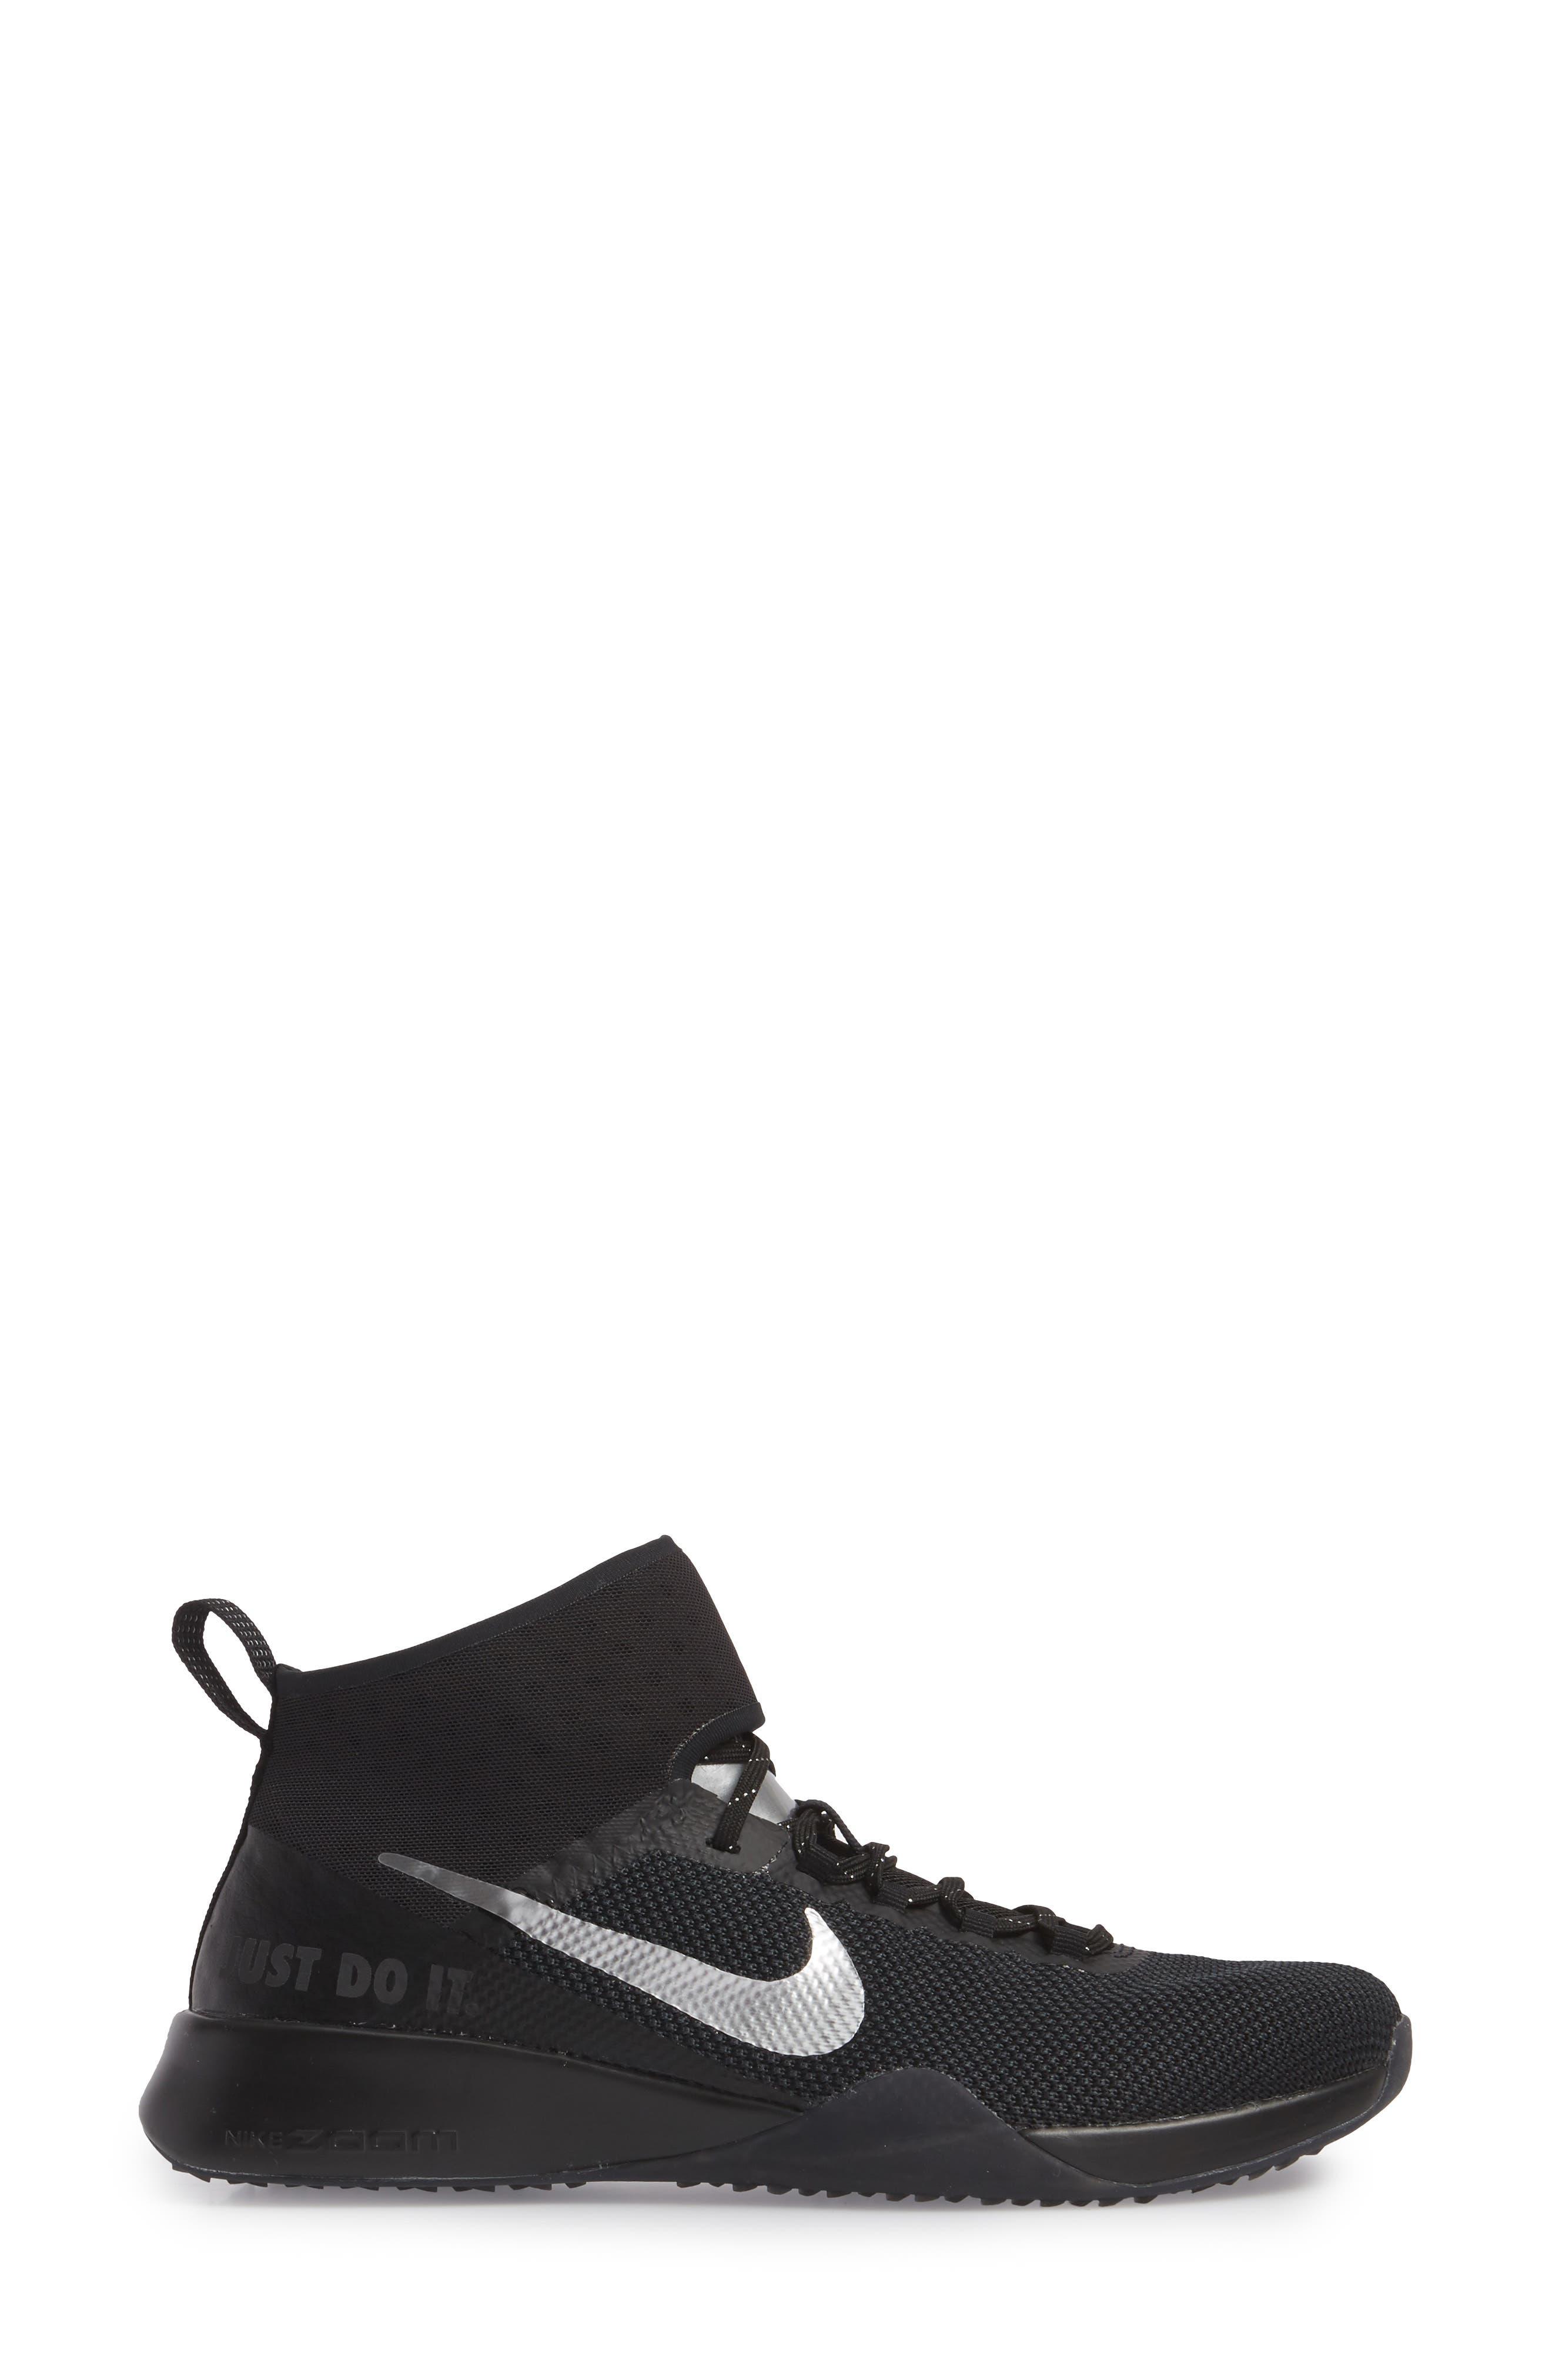 Alternate Image 3  - Nike Air Zoom Strong 2 Selfie Training Shoe (Women)